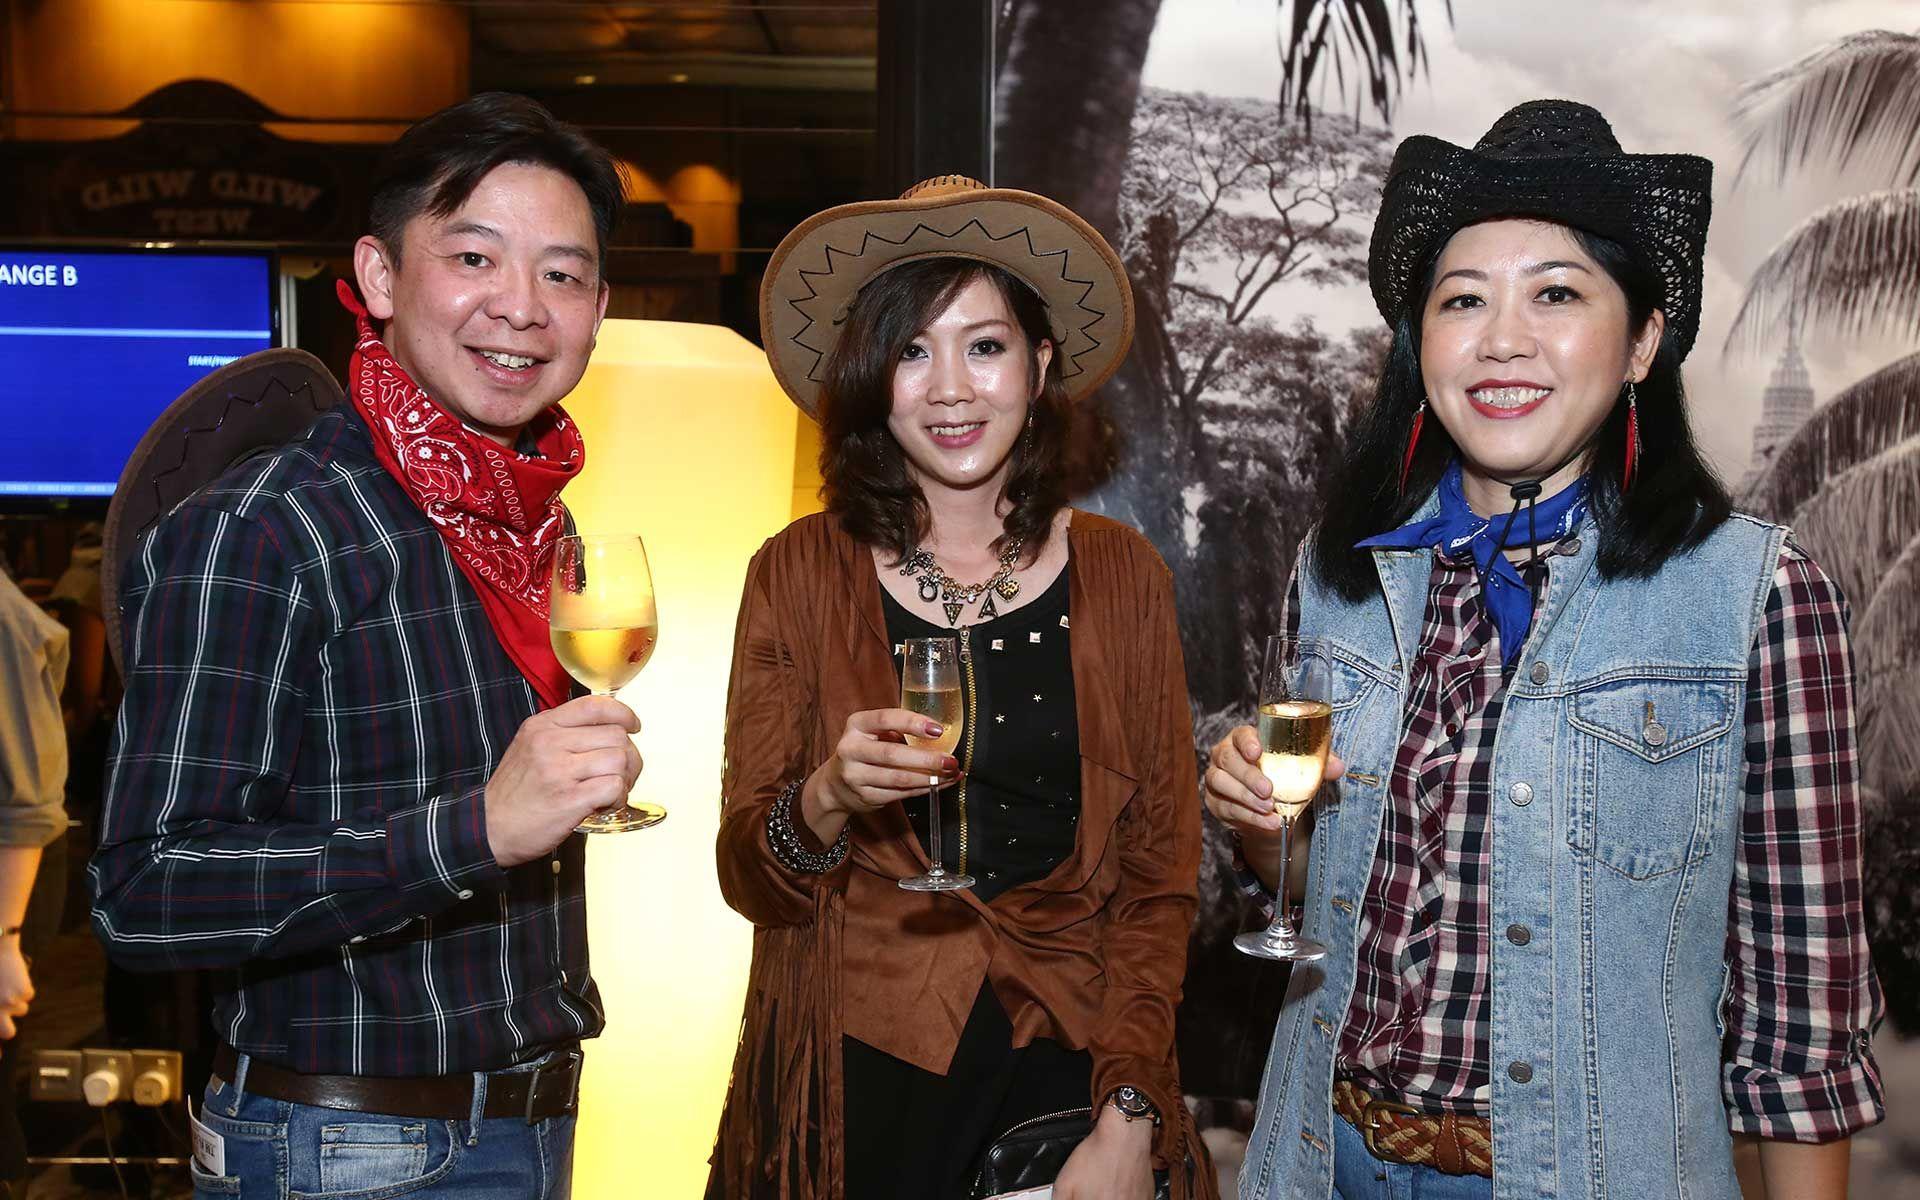 Ho Wei Chung, Michelle Wan and Sharon Khoo